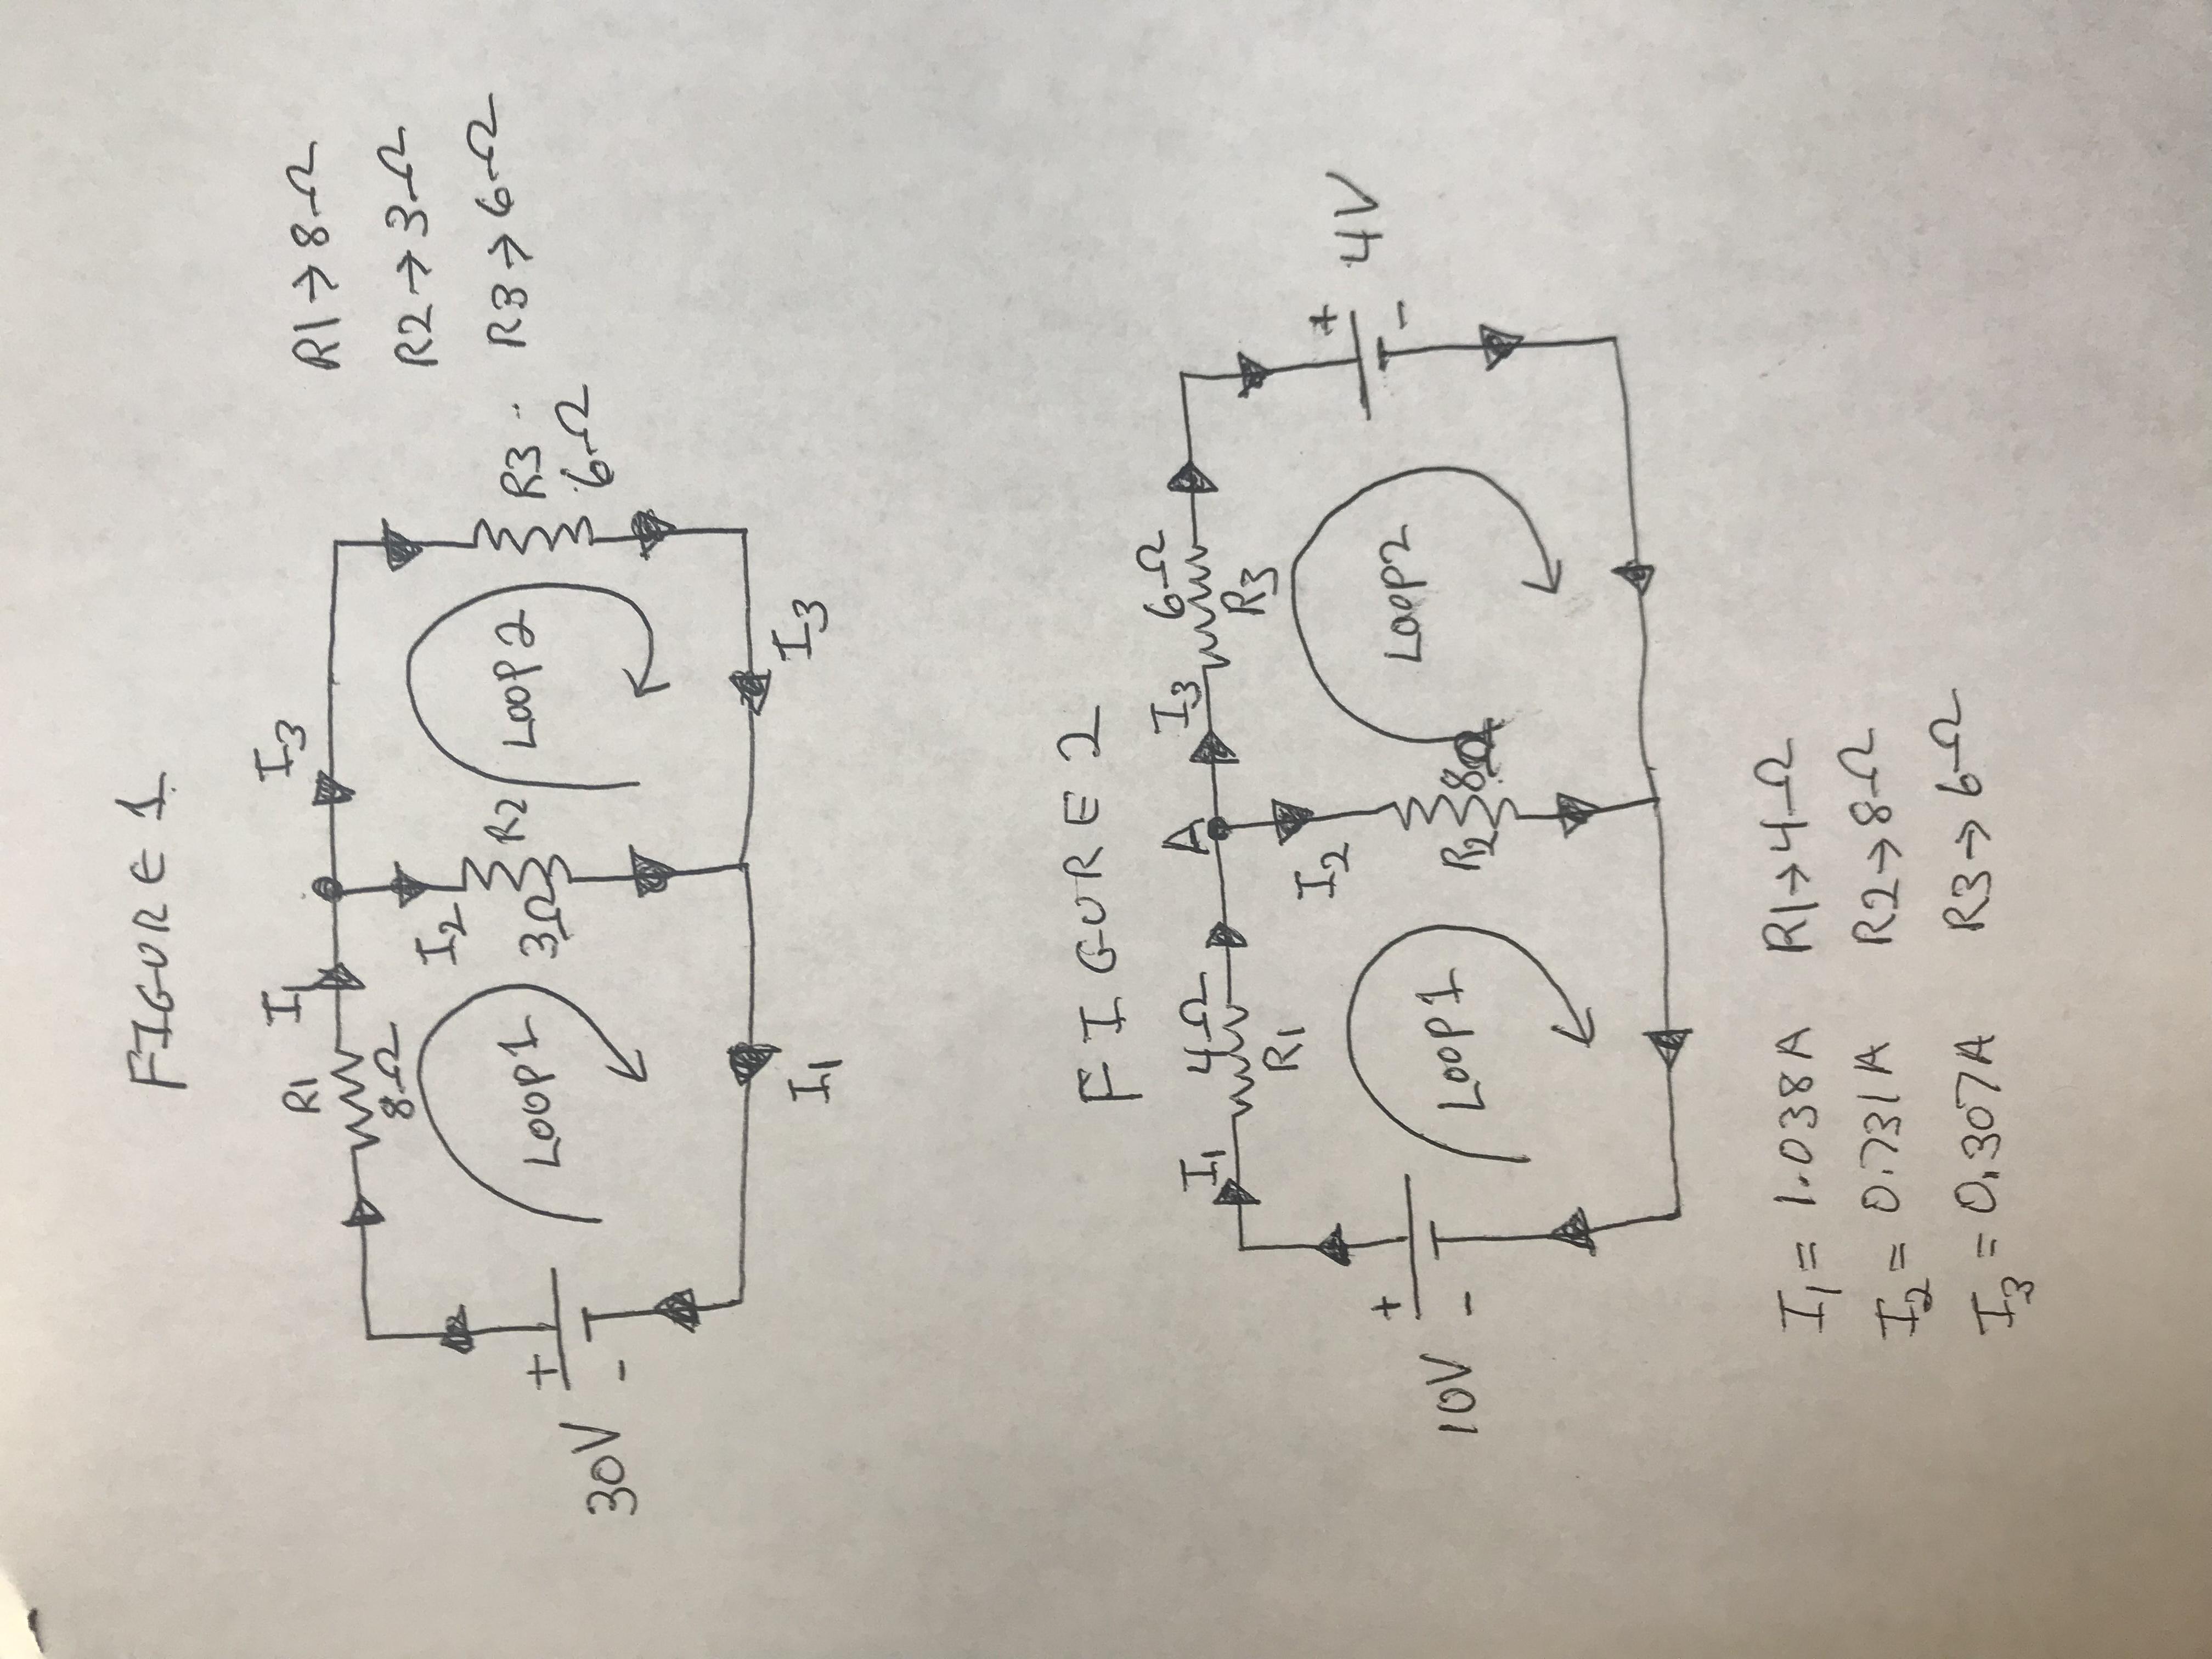 RI I Loop1 301/ Lu 13 Ri 2. 10V-T- Loop1 4V T 0.231A R28